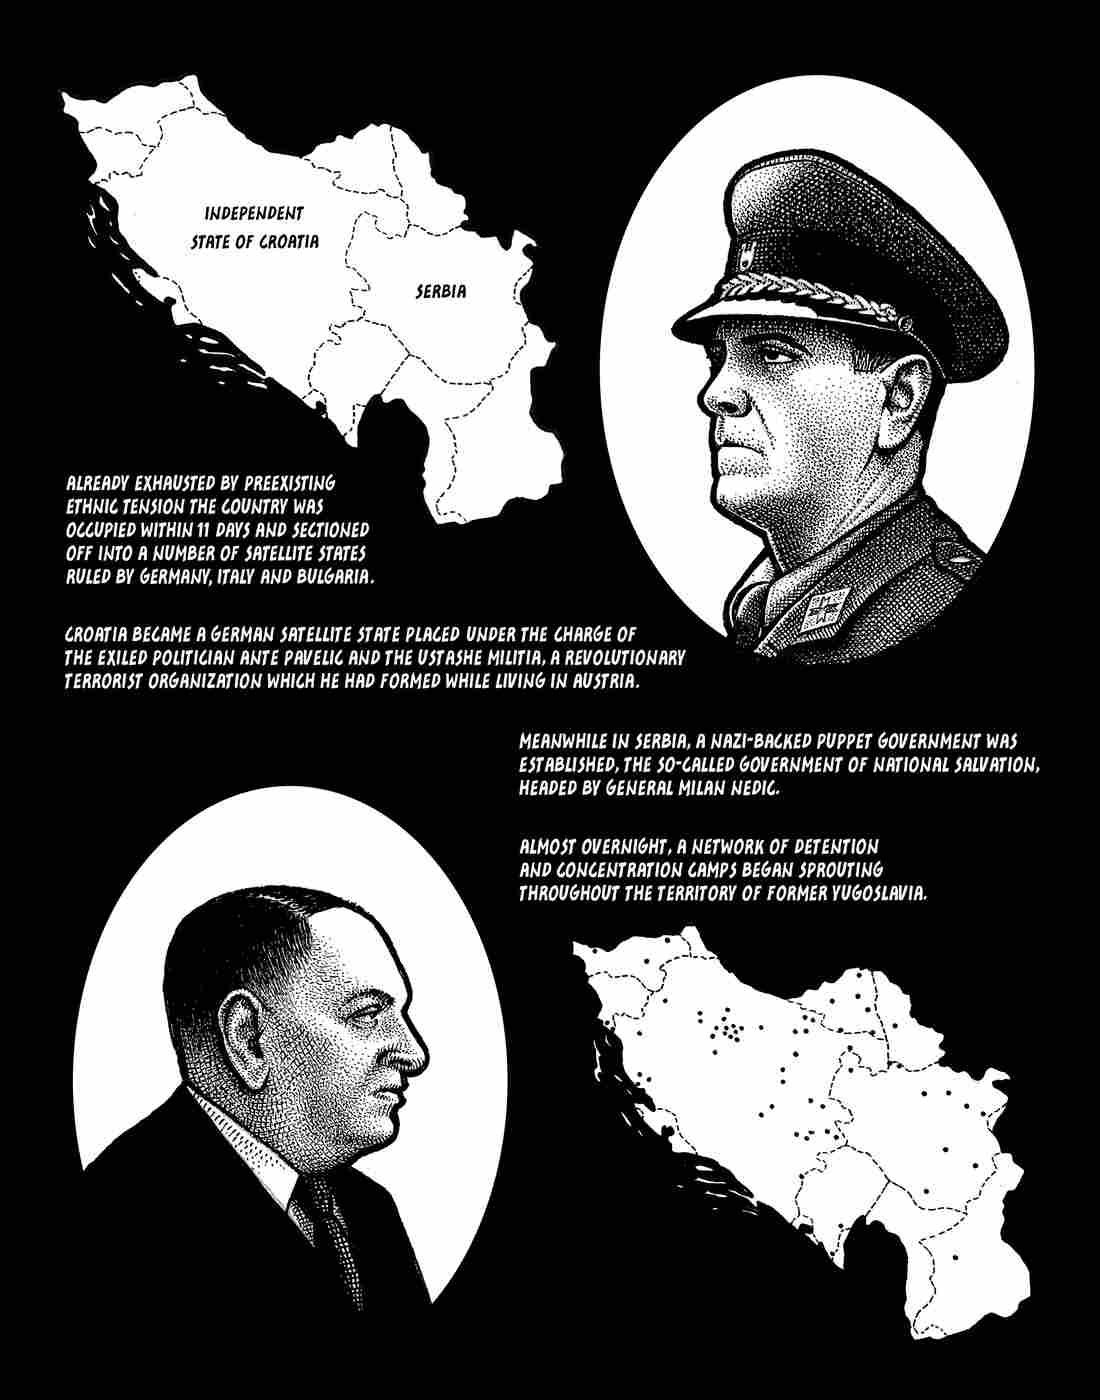 Fatherland pg. 74